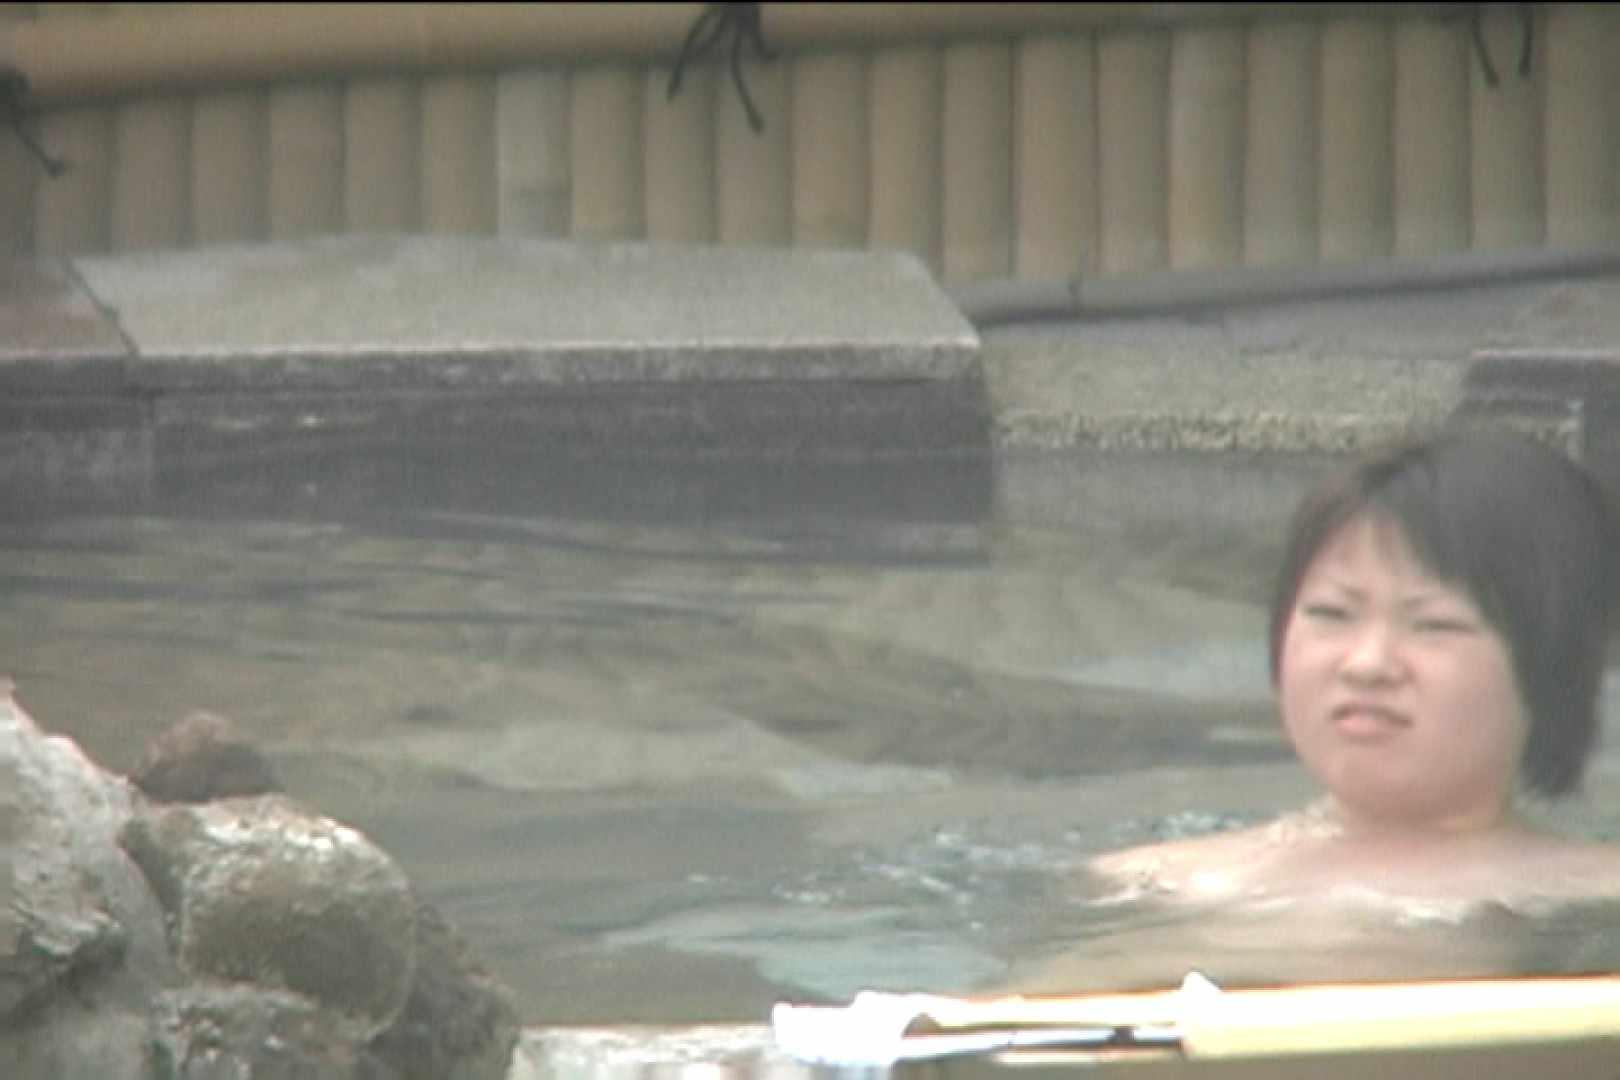 Aquaな露天風呂Vol.141 盗撮 盗撮動画紹介 18連発 14